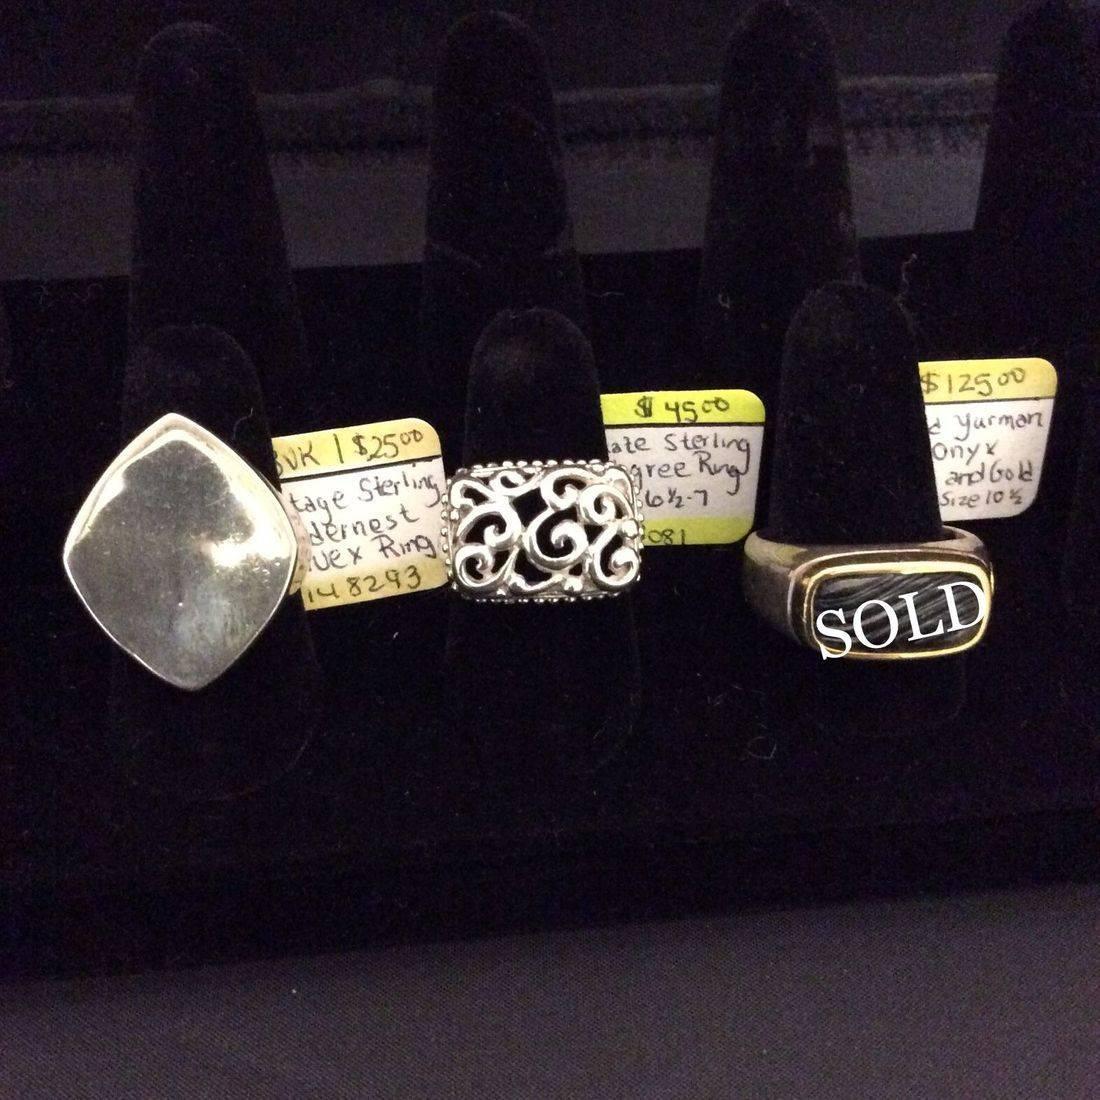 Vin. Sterling, Modernist, Convex Ring  $25,  Ornate Sterling, Filigree Ring  $45,  David Yurman, DY Onyx, Sterling & Gold Ring  $125.00